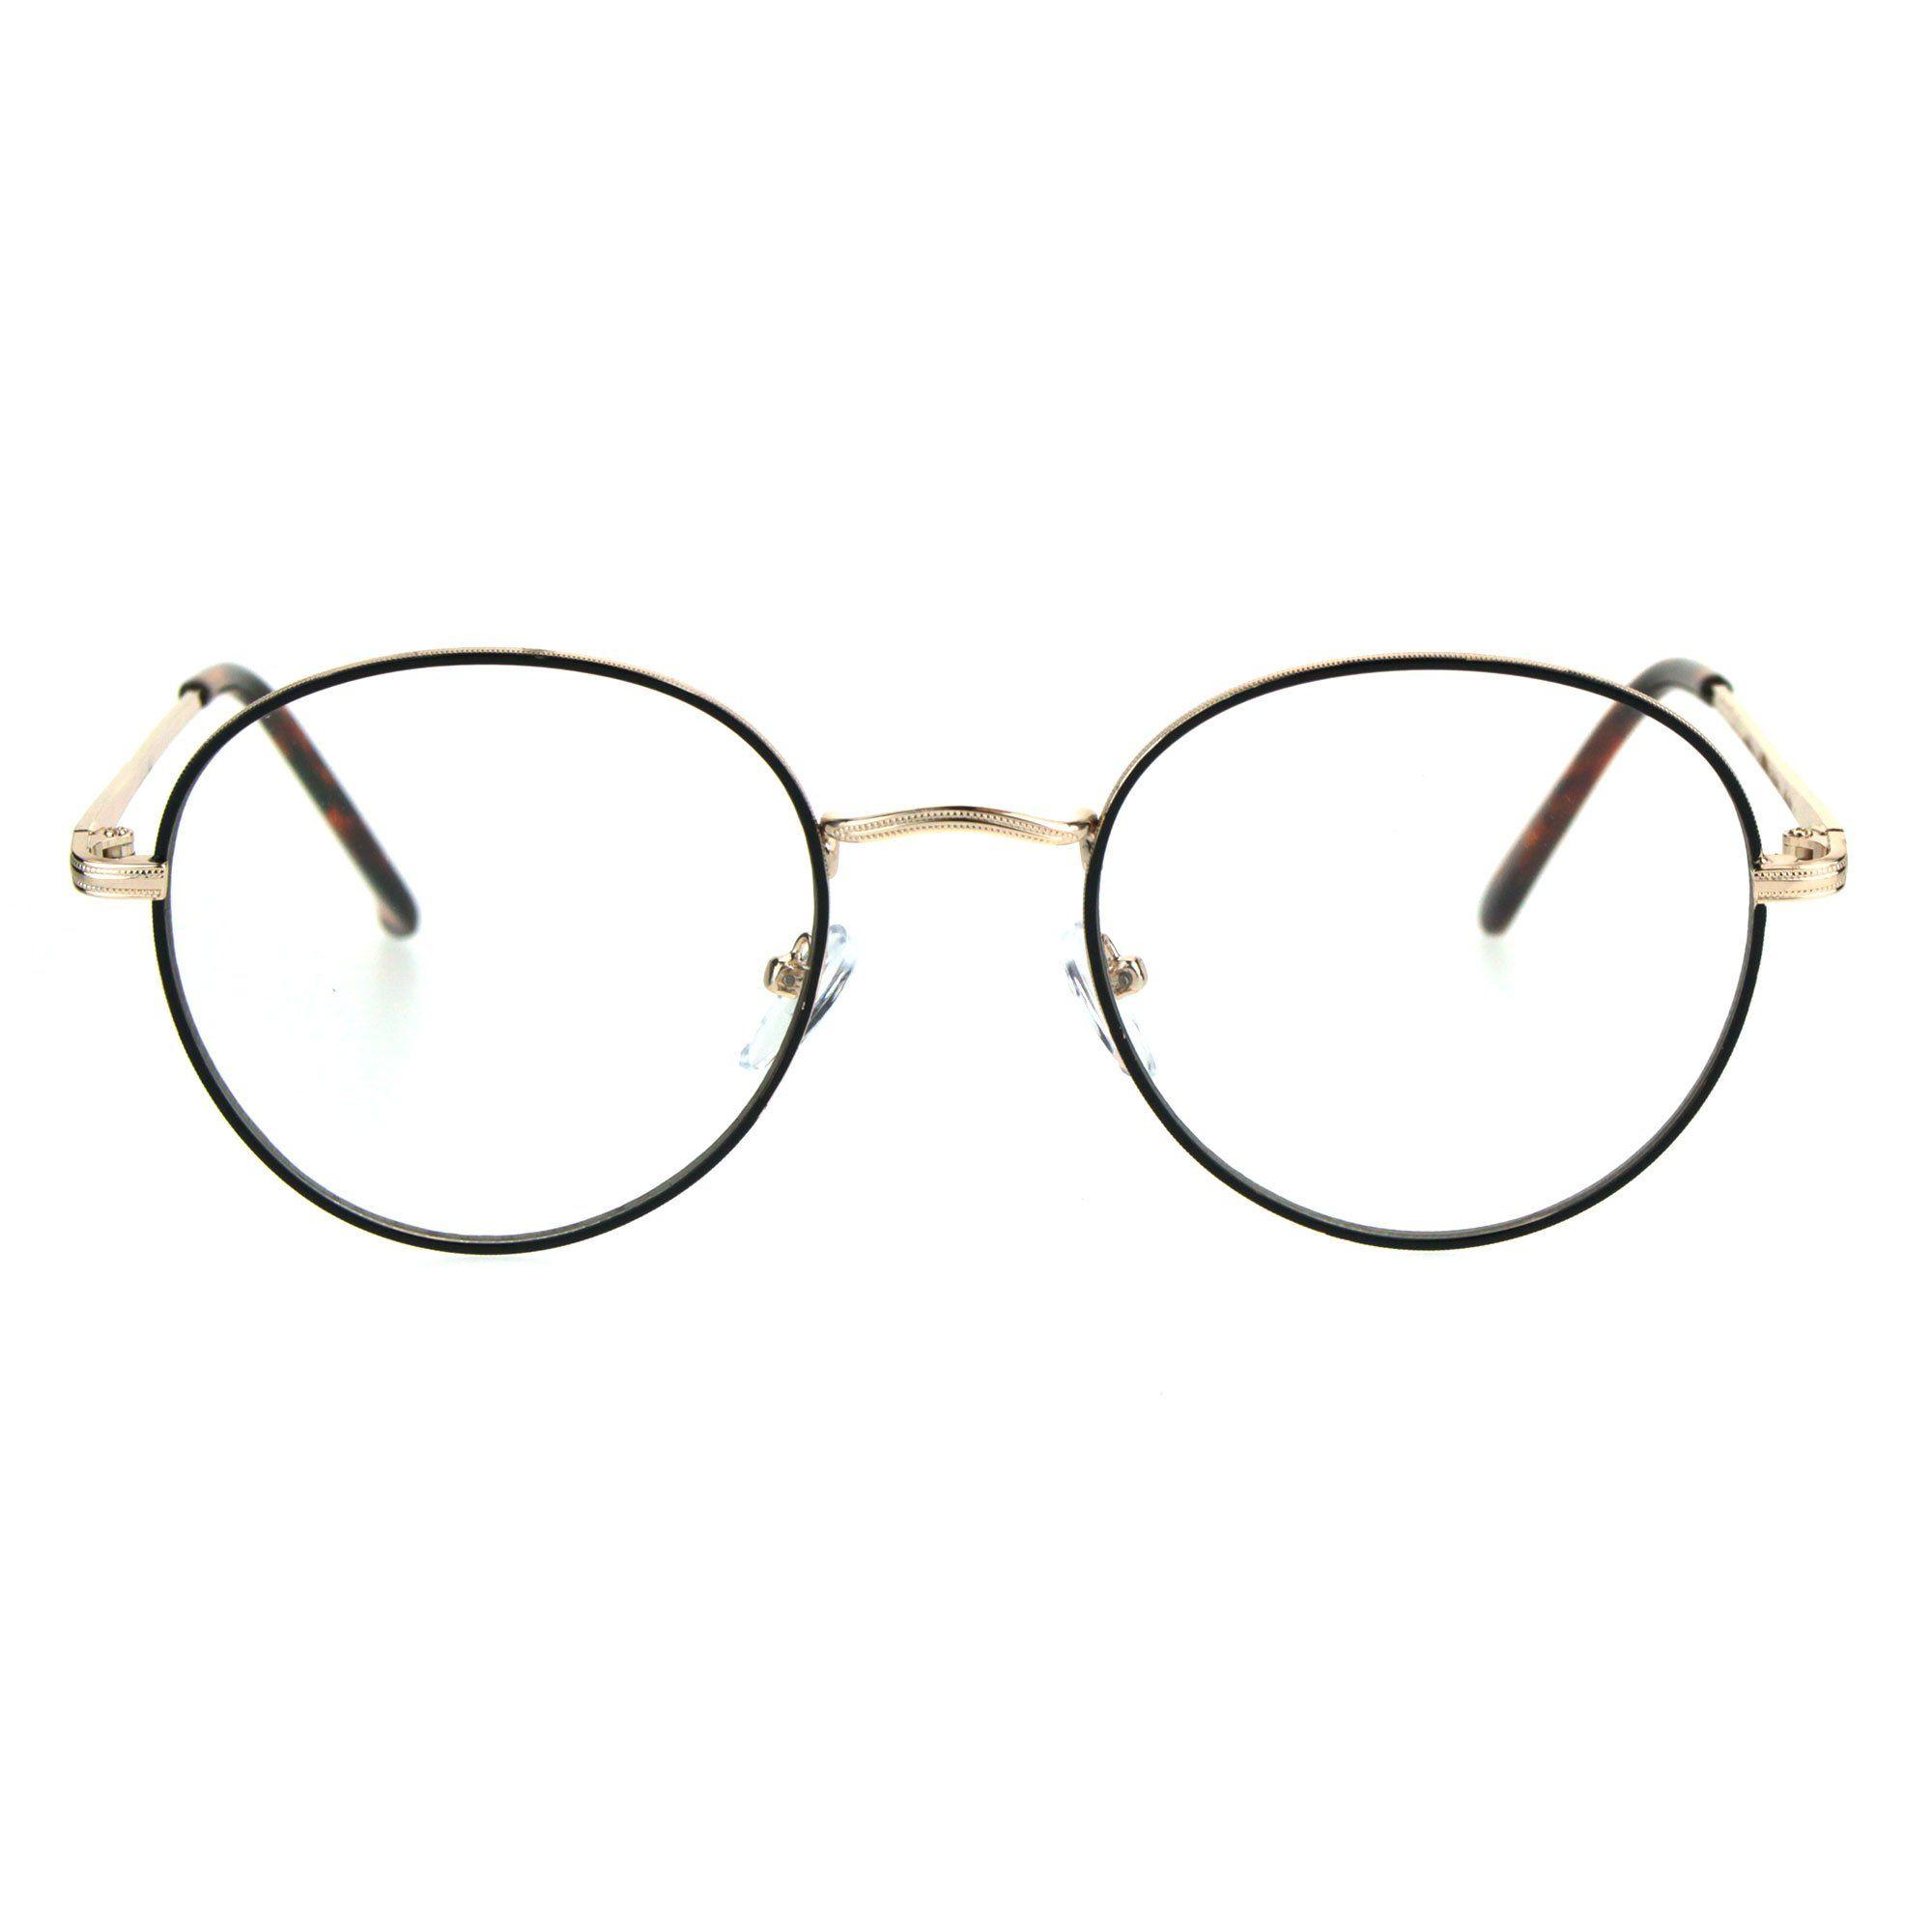 1249d1f140b Unisex Clear Lens Glasses Vintage Fashion Round Oval Metal Frame Eyeglasses  - Measurements  5 5